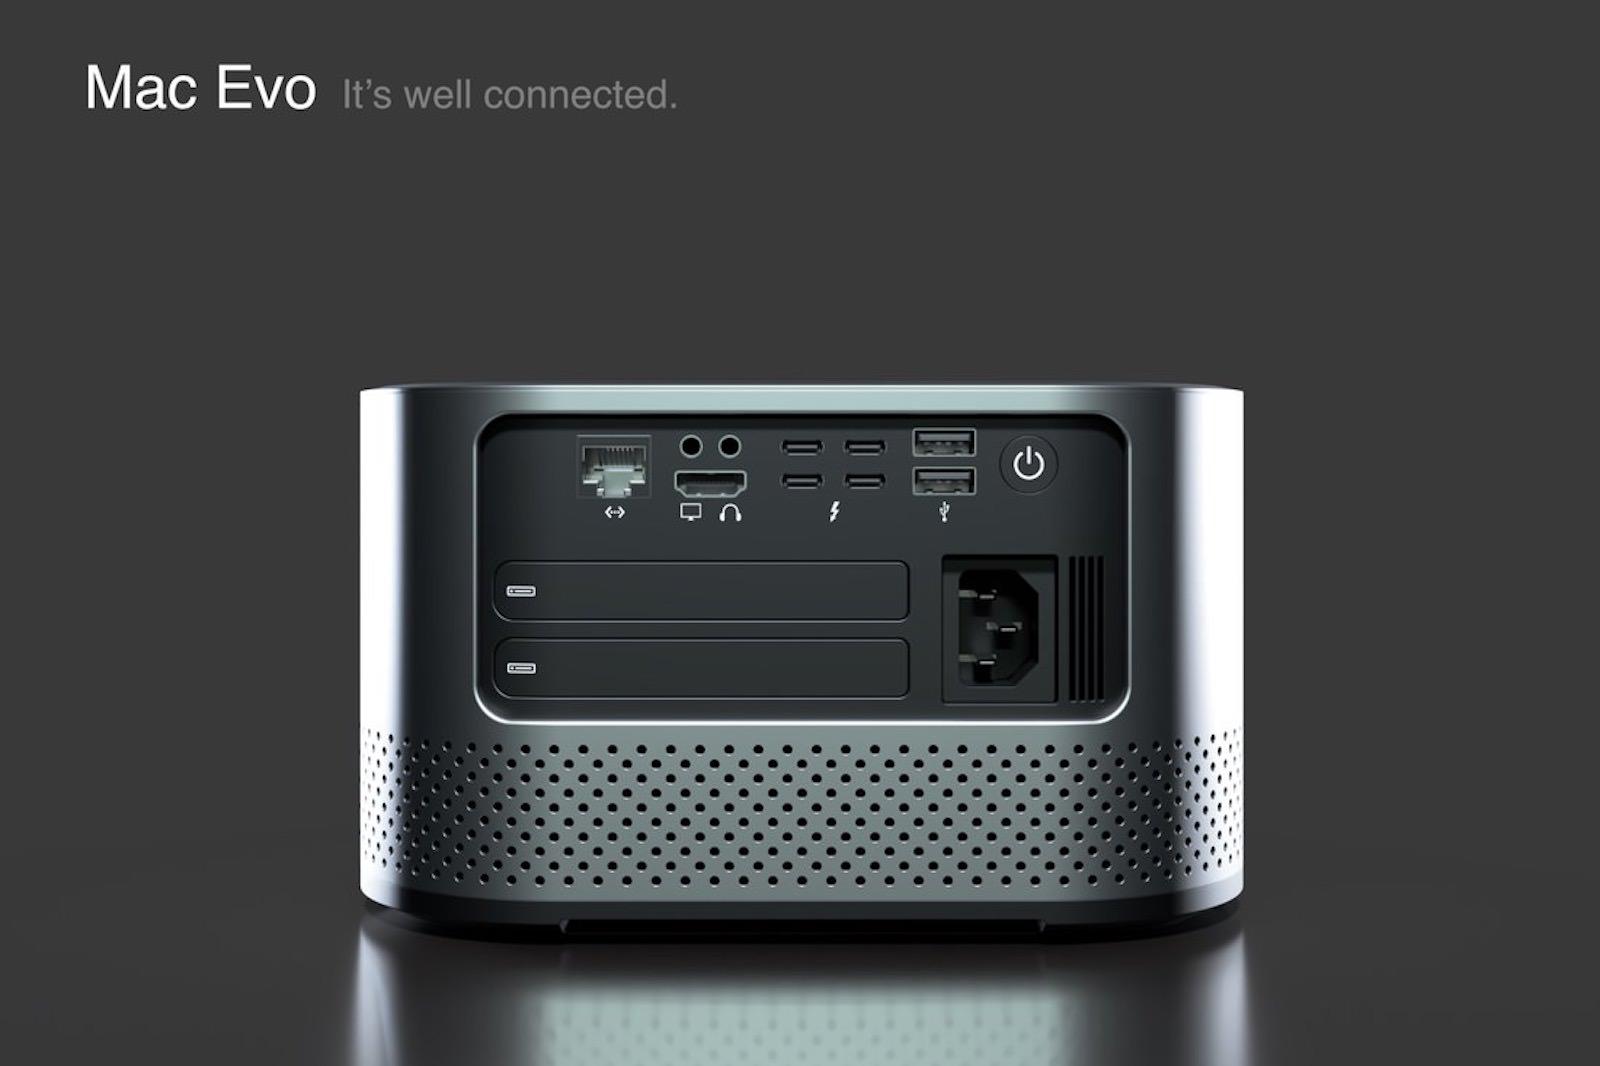 Mac Evo Concept image 2